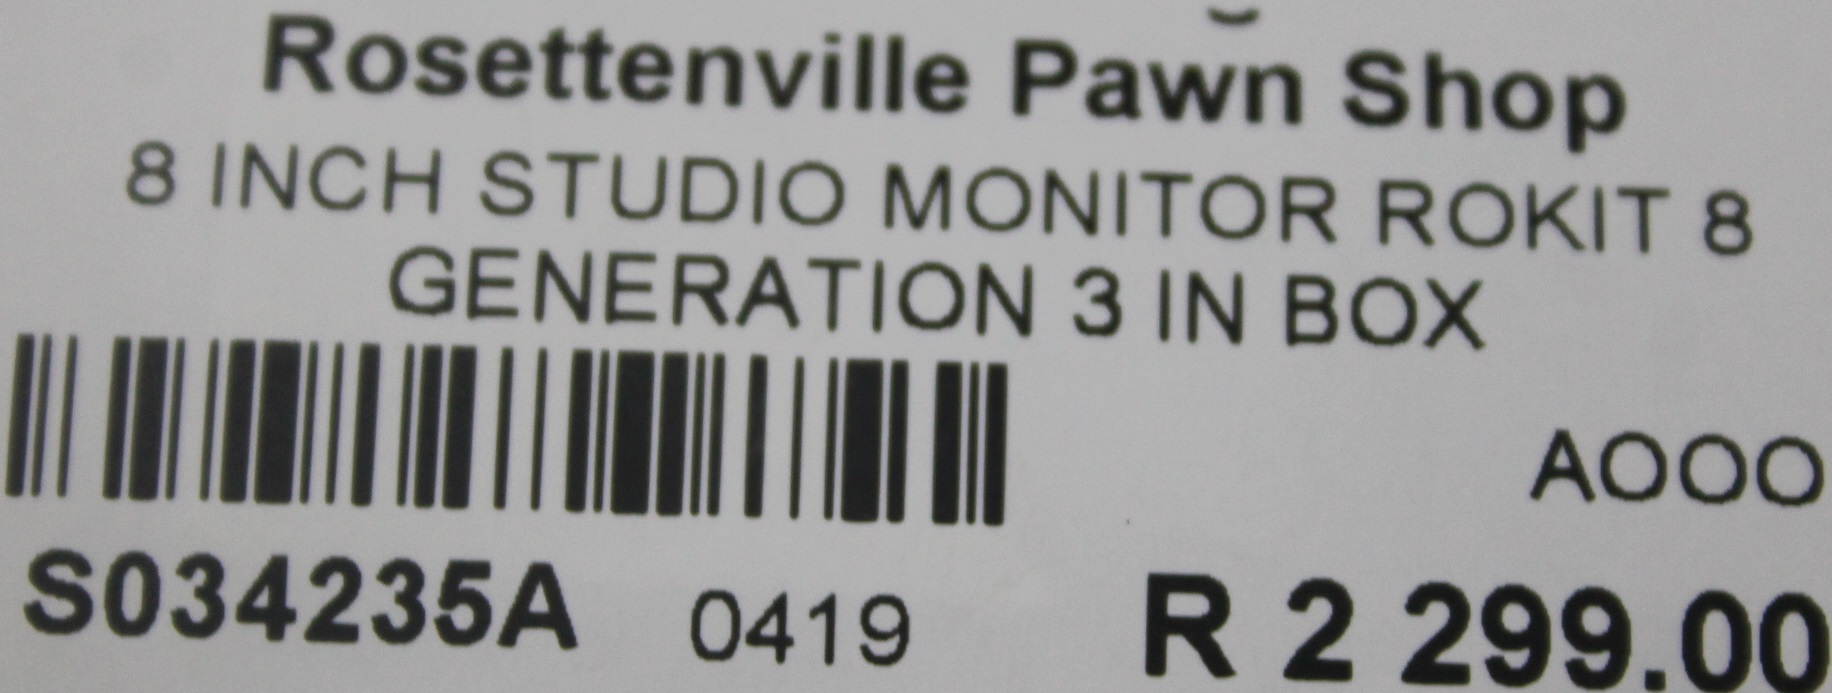 S034235A 8 inch studio monitor rokit 8 generation #Rosettenvillepawnshop